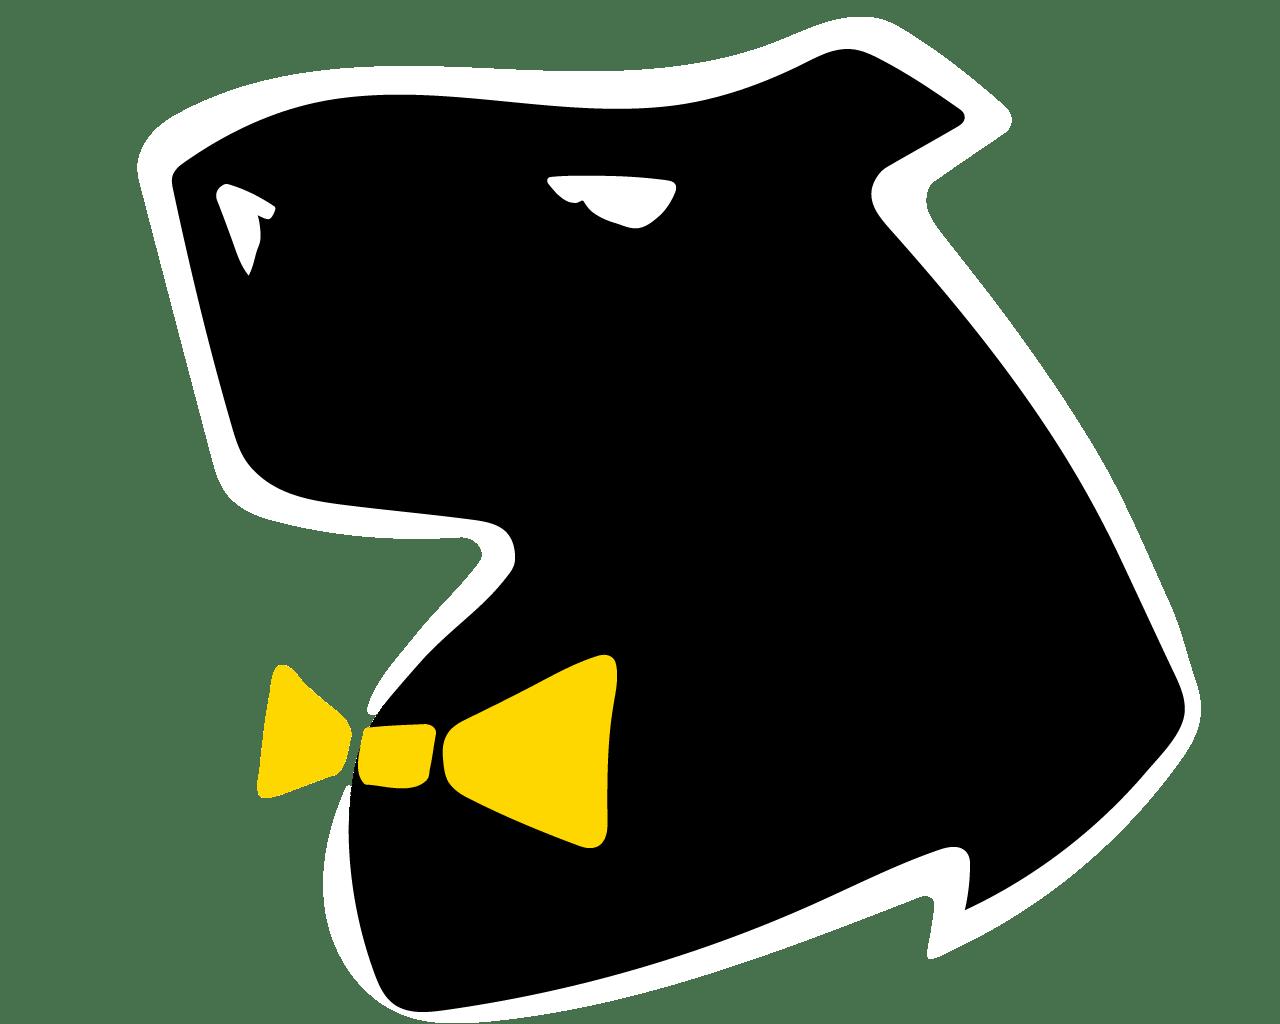 https://static.tildacdn.com/tild3065-3065-4235-a130-633936306134/CAPY_logo.png